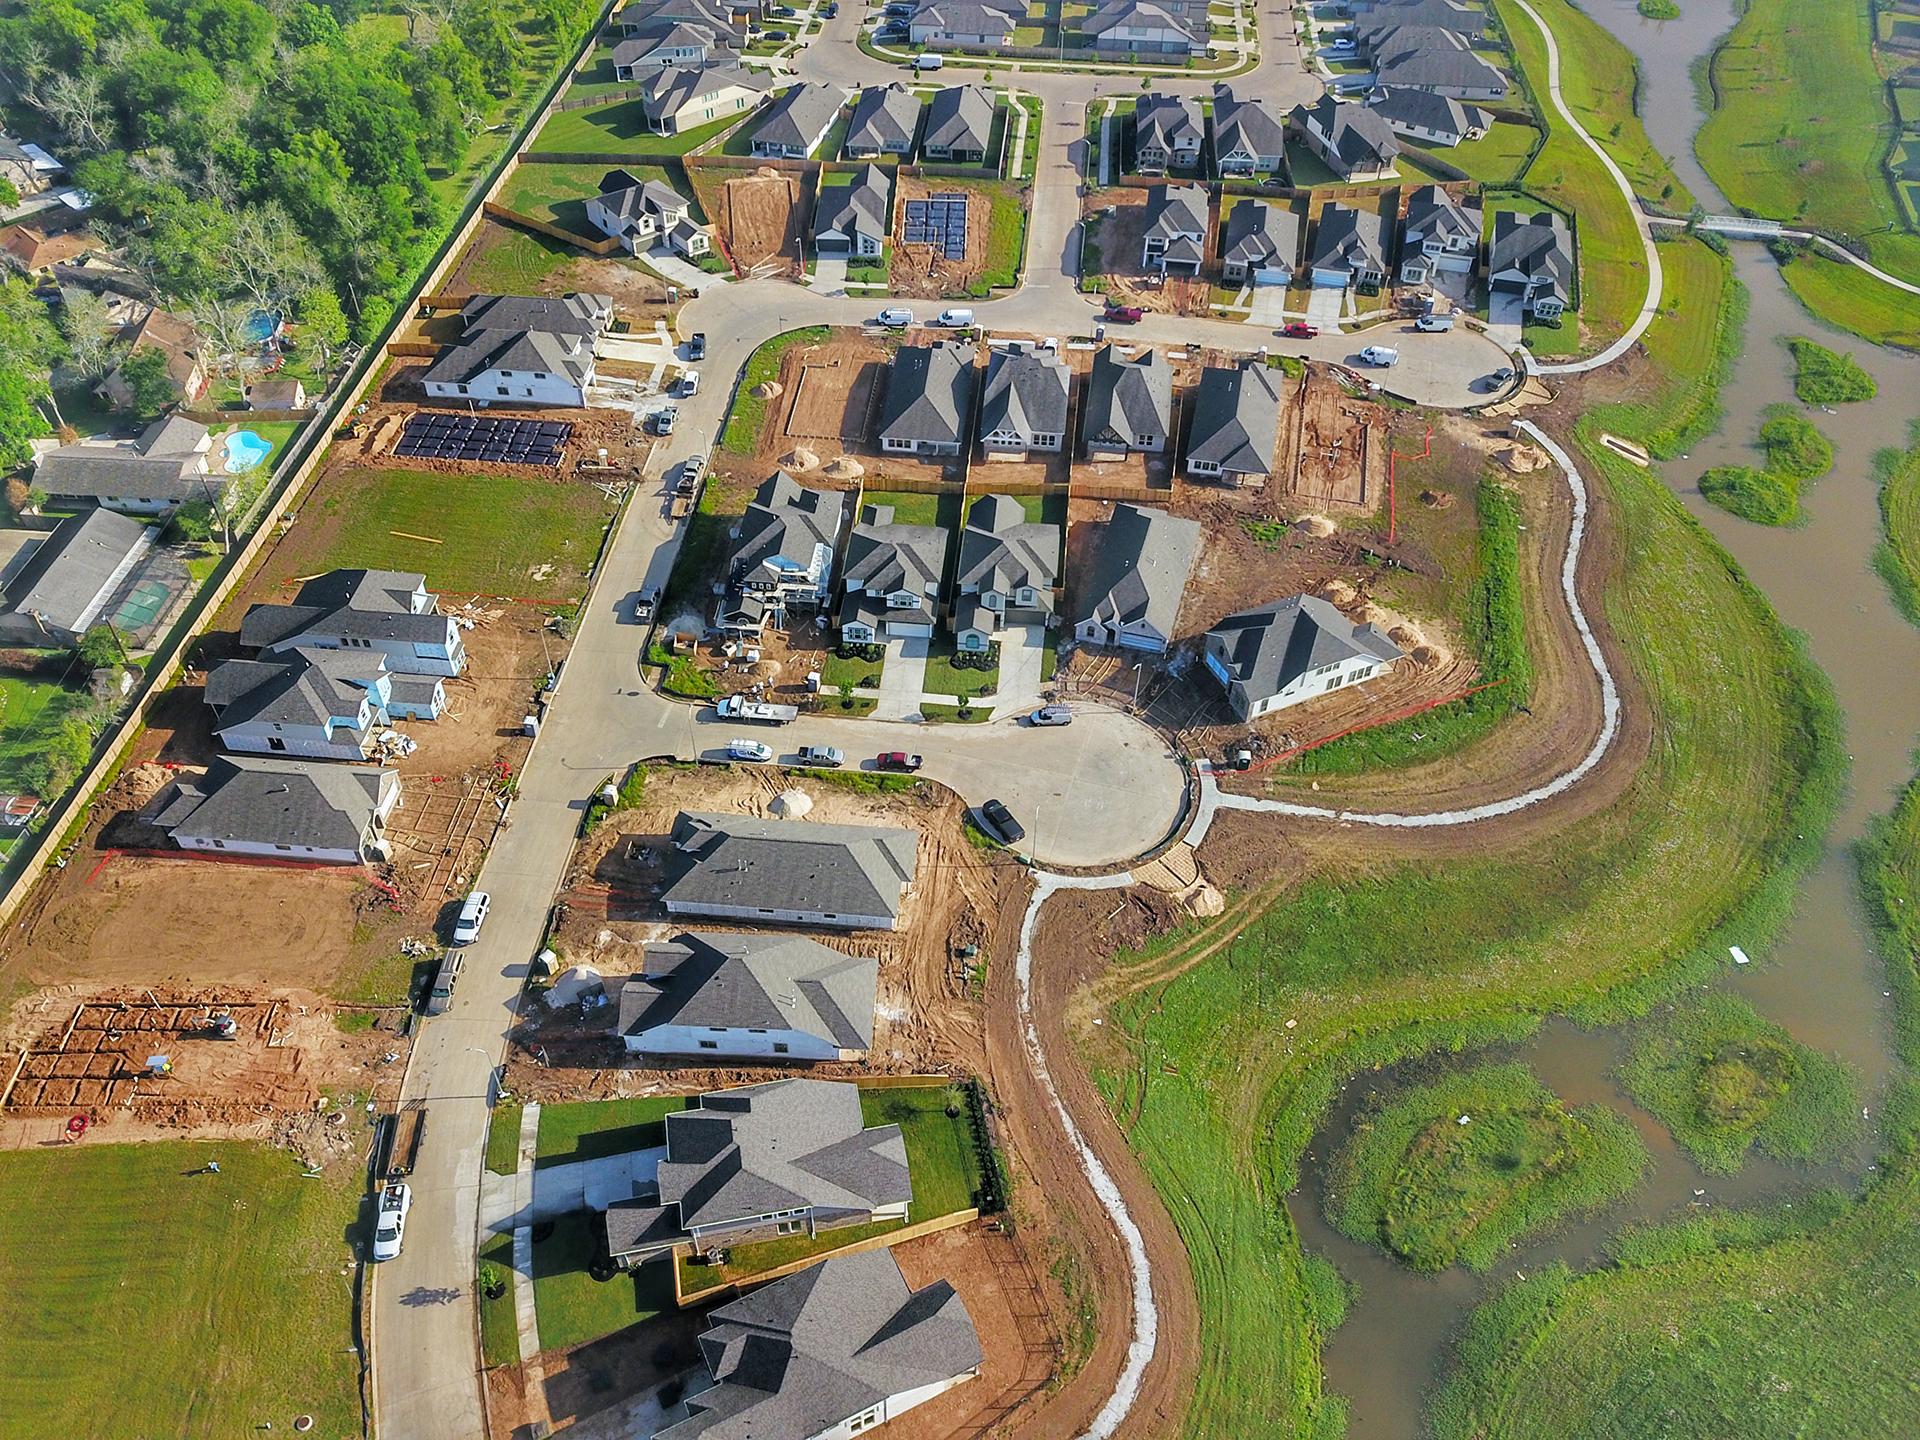 Veranda - Costello Engineering Project for residential+development, drainage, surveying,